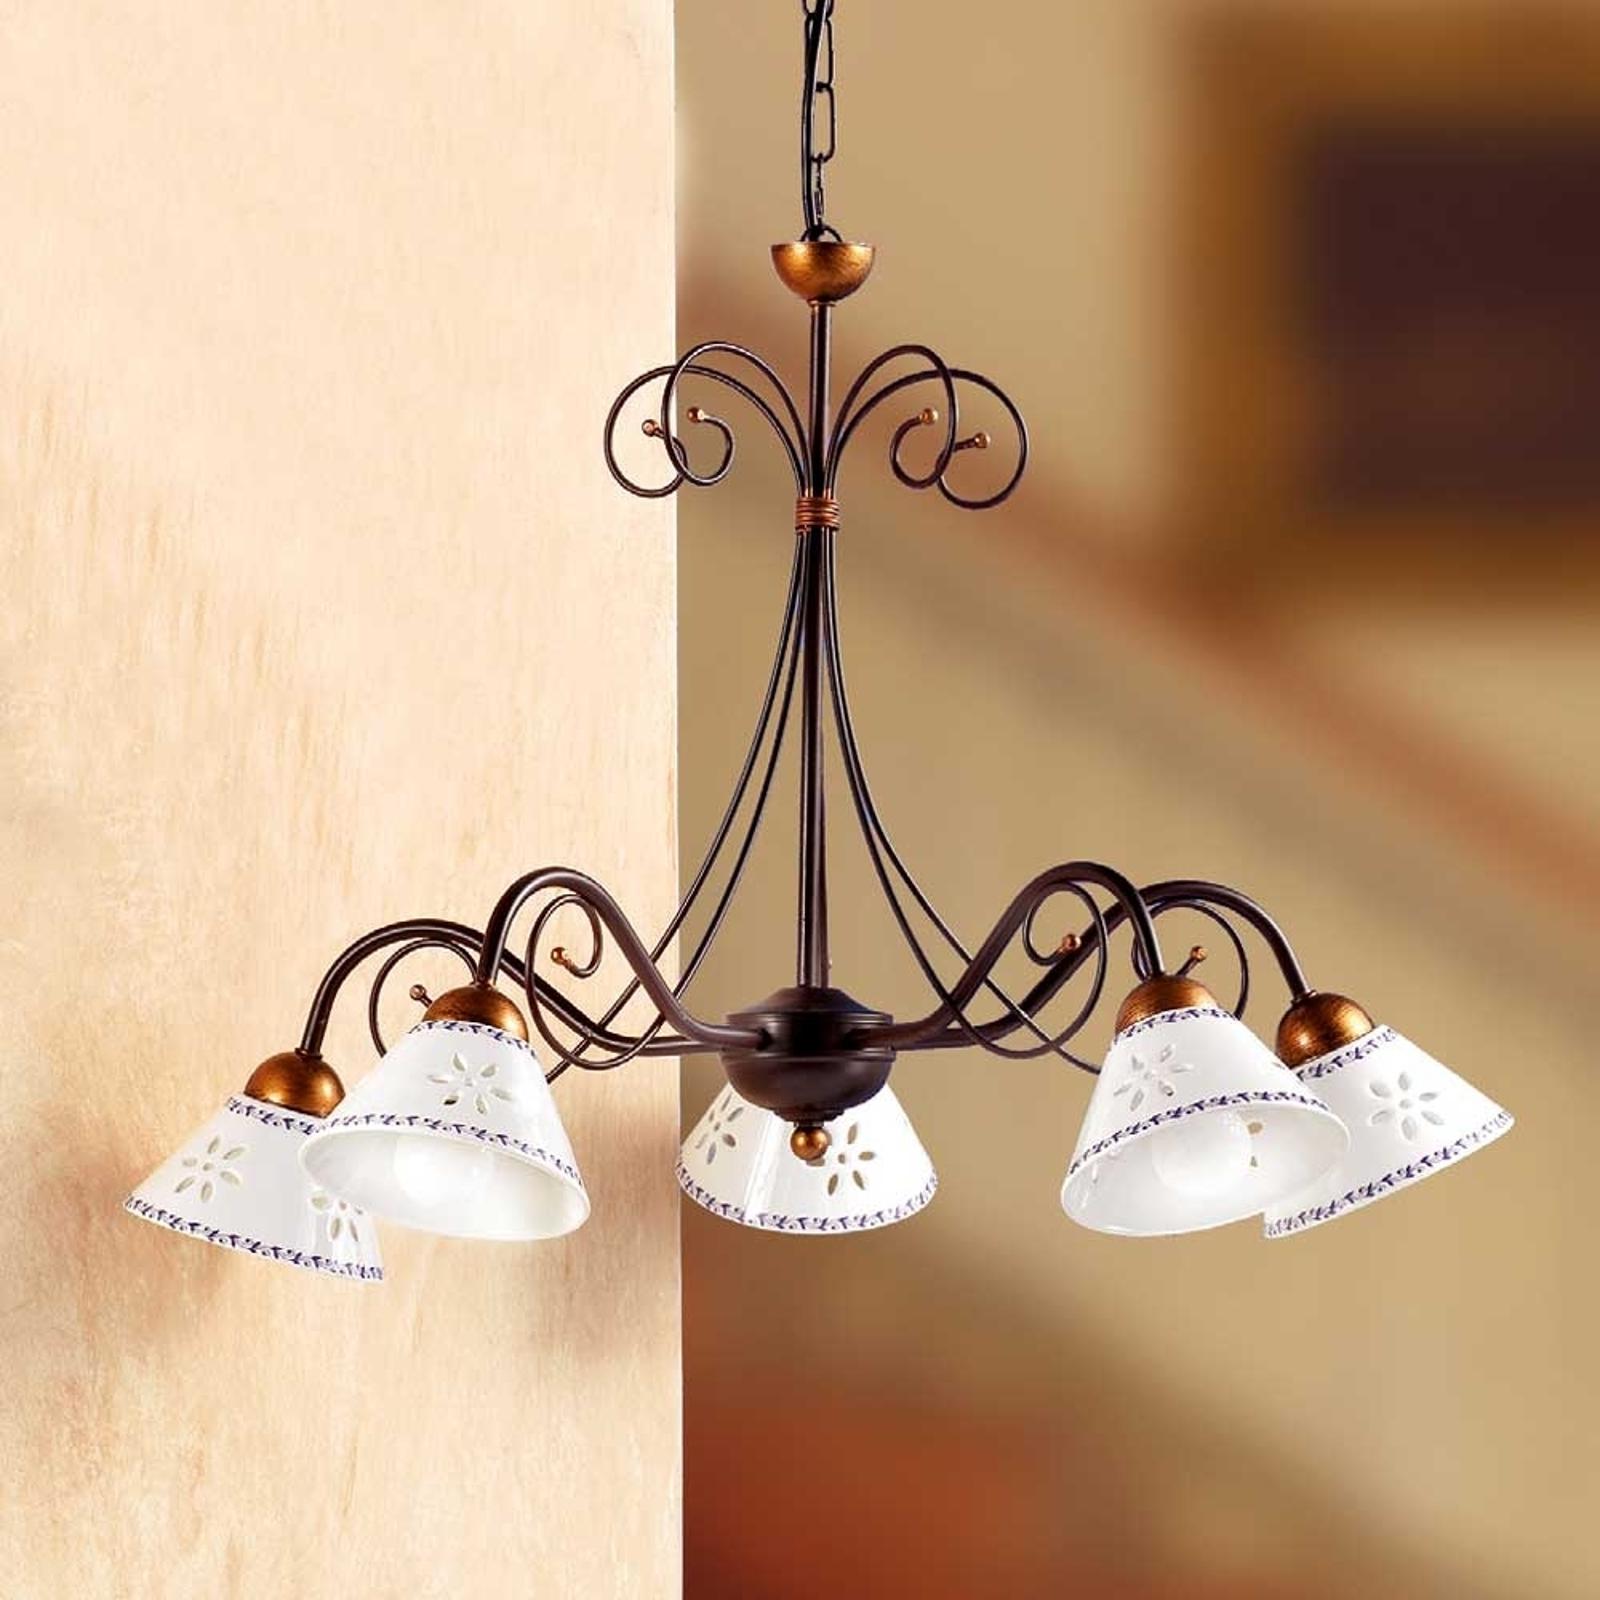 Romantyczna lampa wisząca LIBERTY 5 punktowa